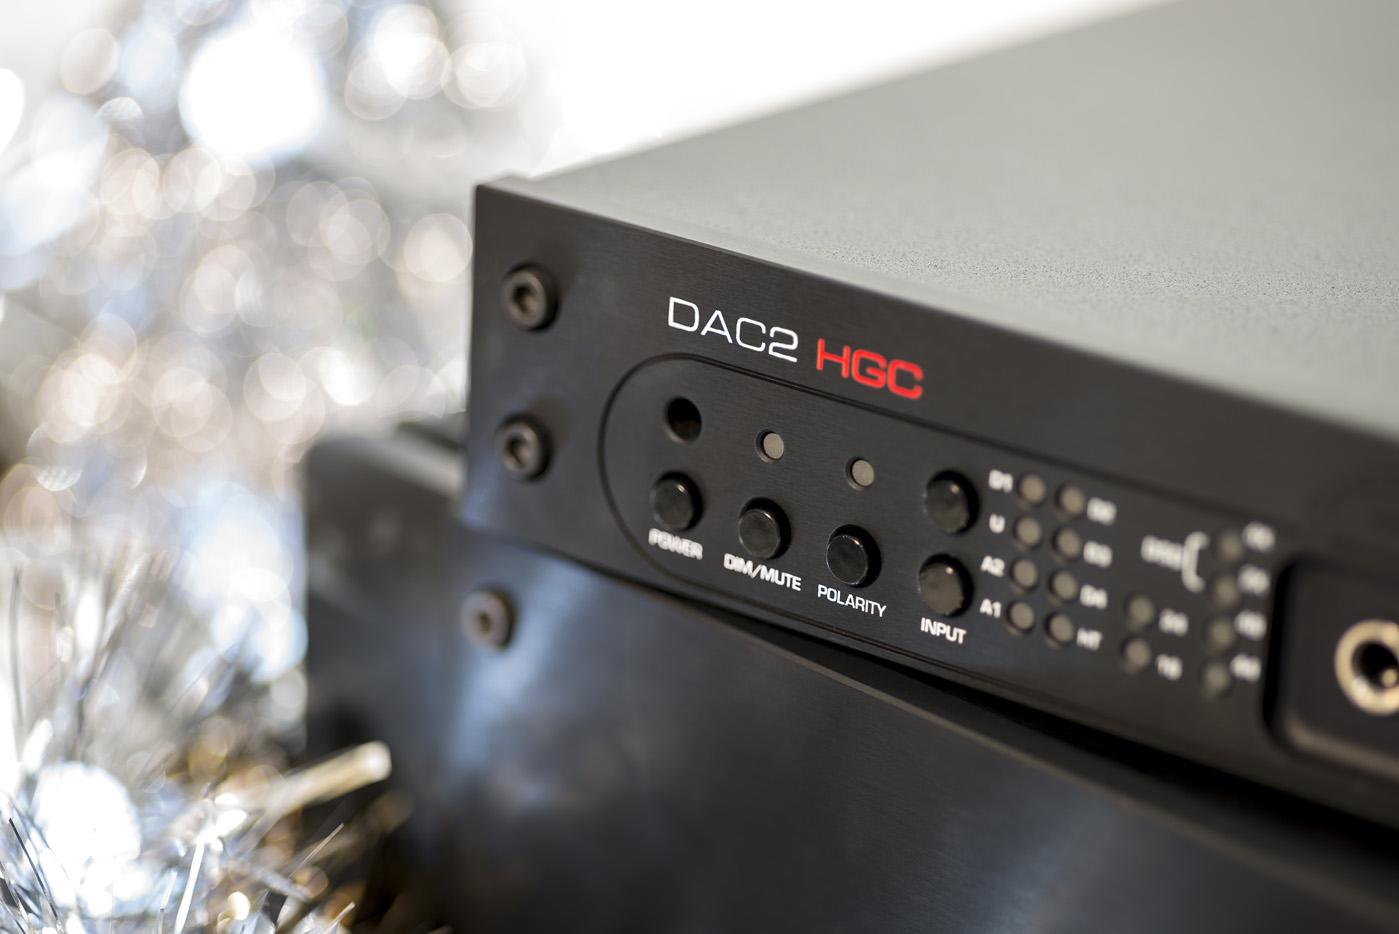 Over 10% OFF - Benchmark DAC2 HGC + AHB2 Power Amp